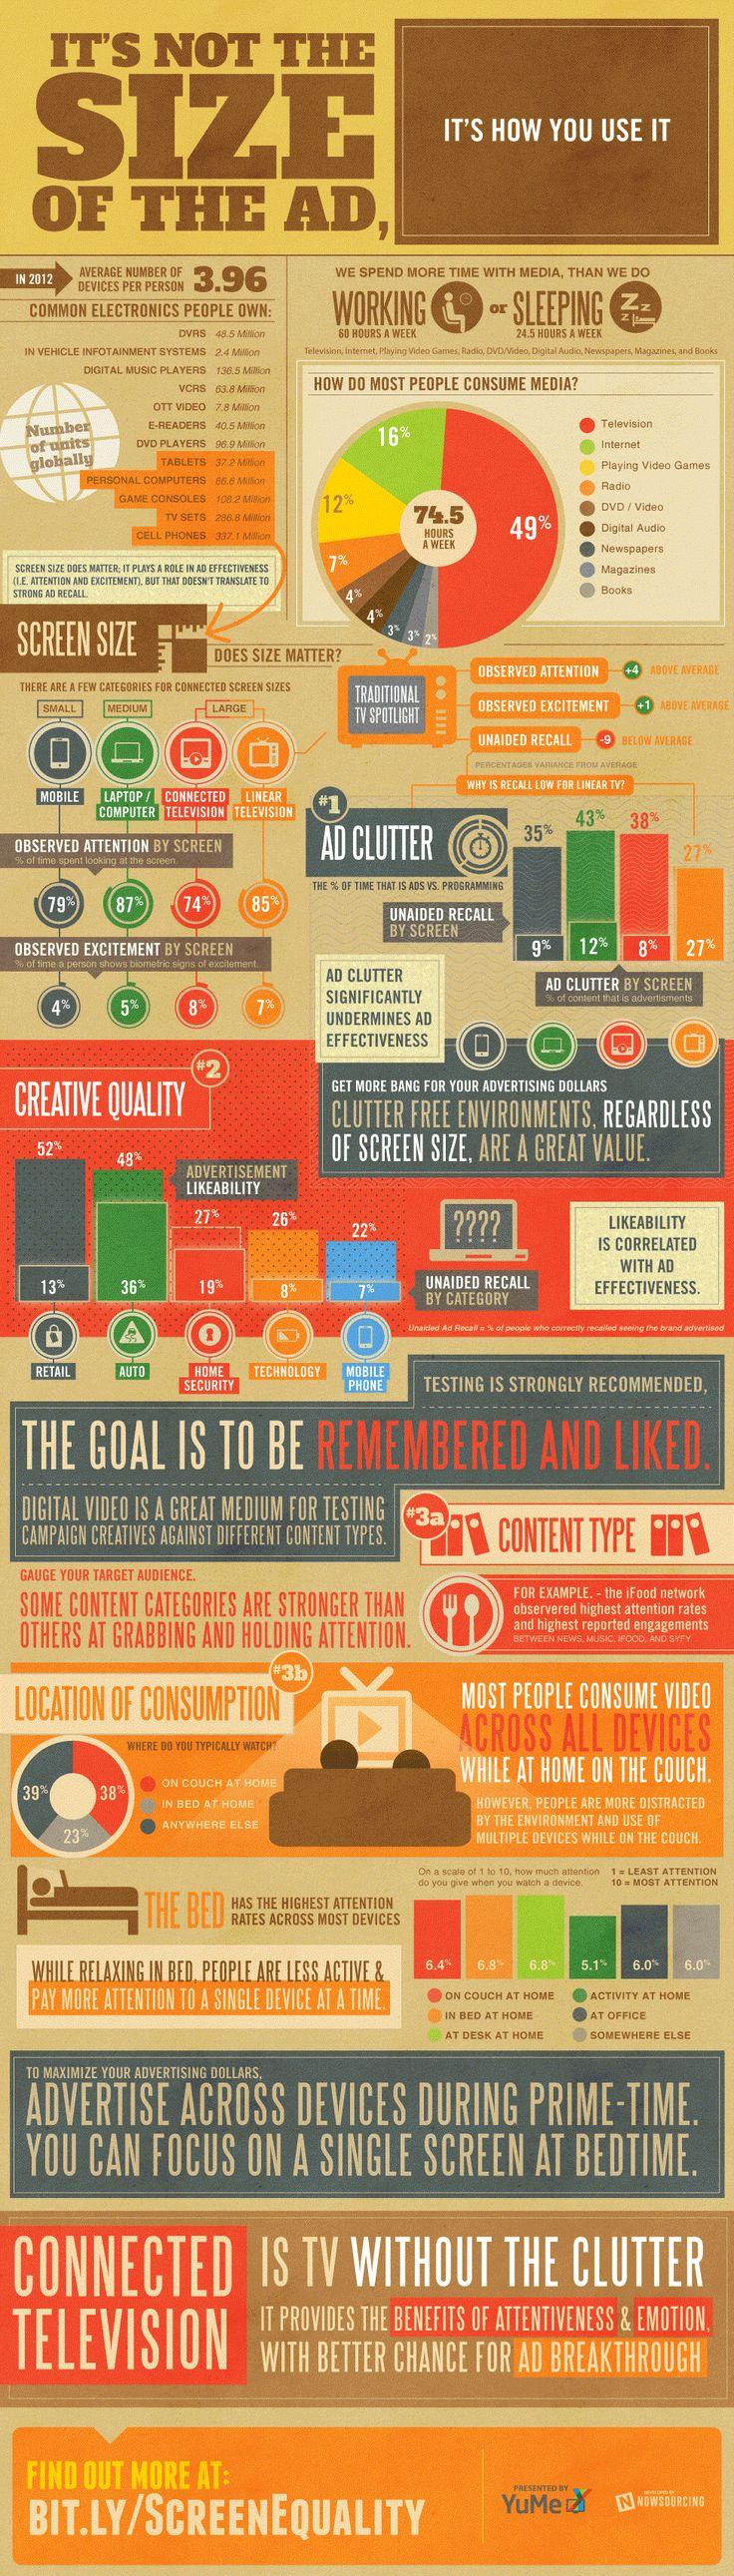 It's Not the Size of the Ad, It's How You Use It. - infographie - www.eewee.fr